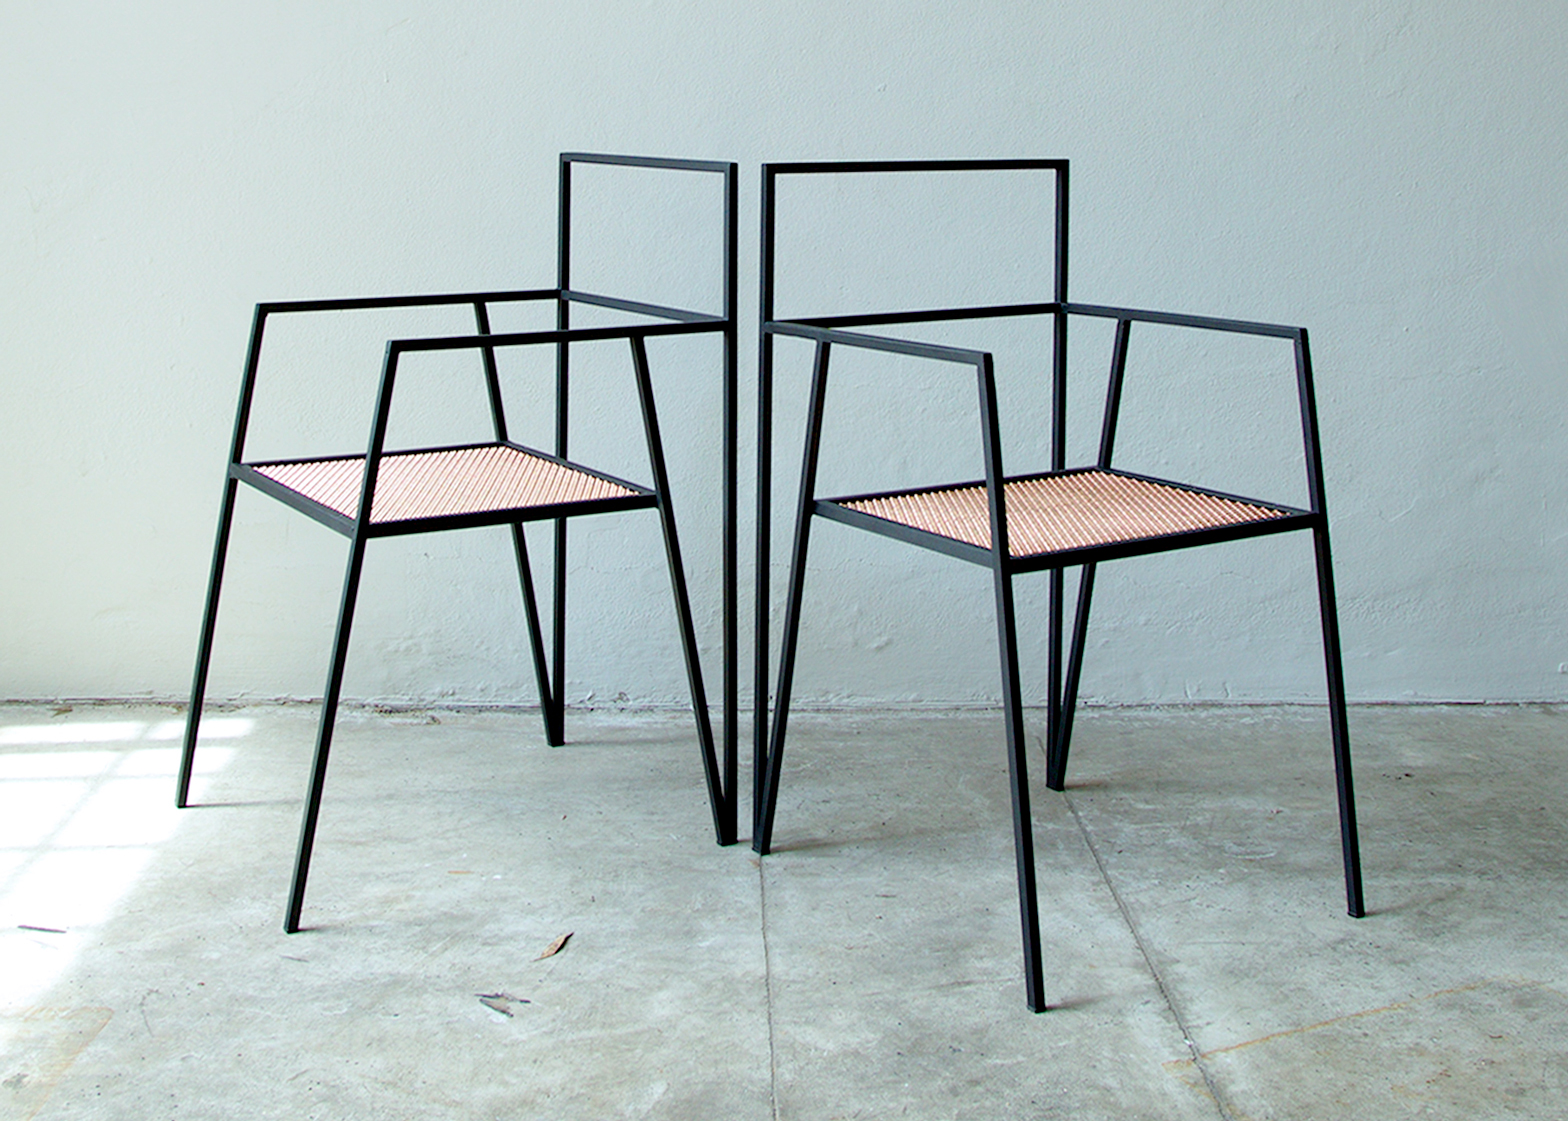 Alpina-furniture_Ries_steel_dezeen_ban.jpg